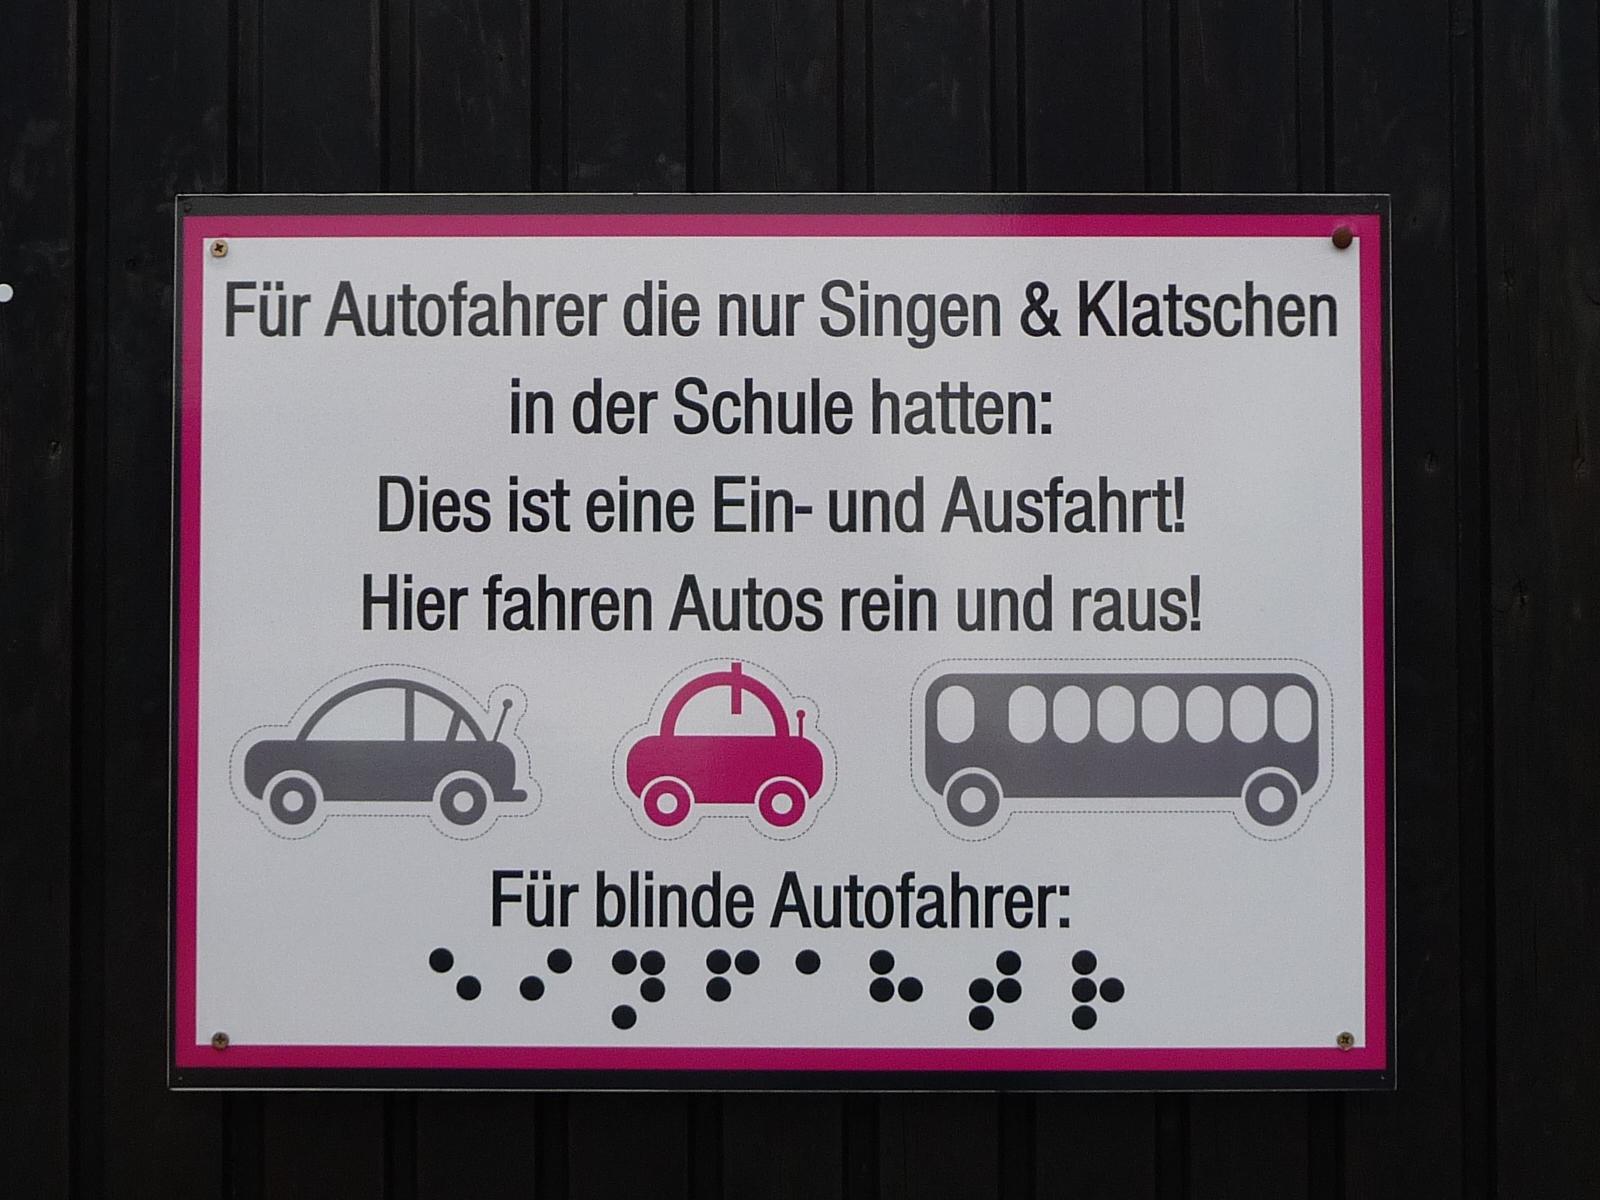 Fuer_blinde_Autofahrer_(Ausfahtr).JPG